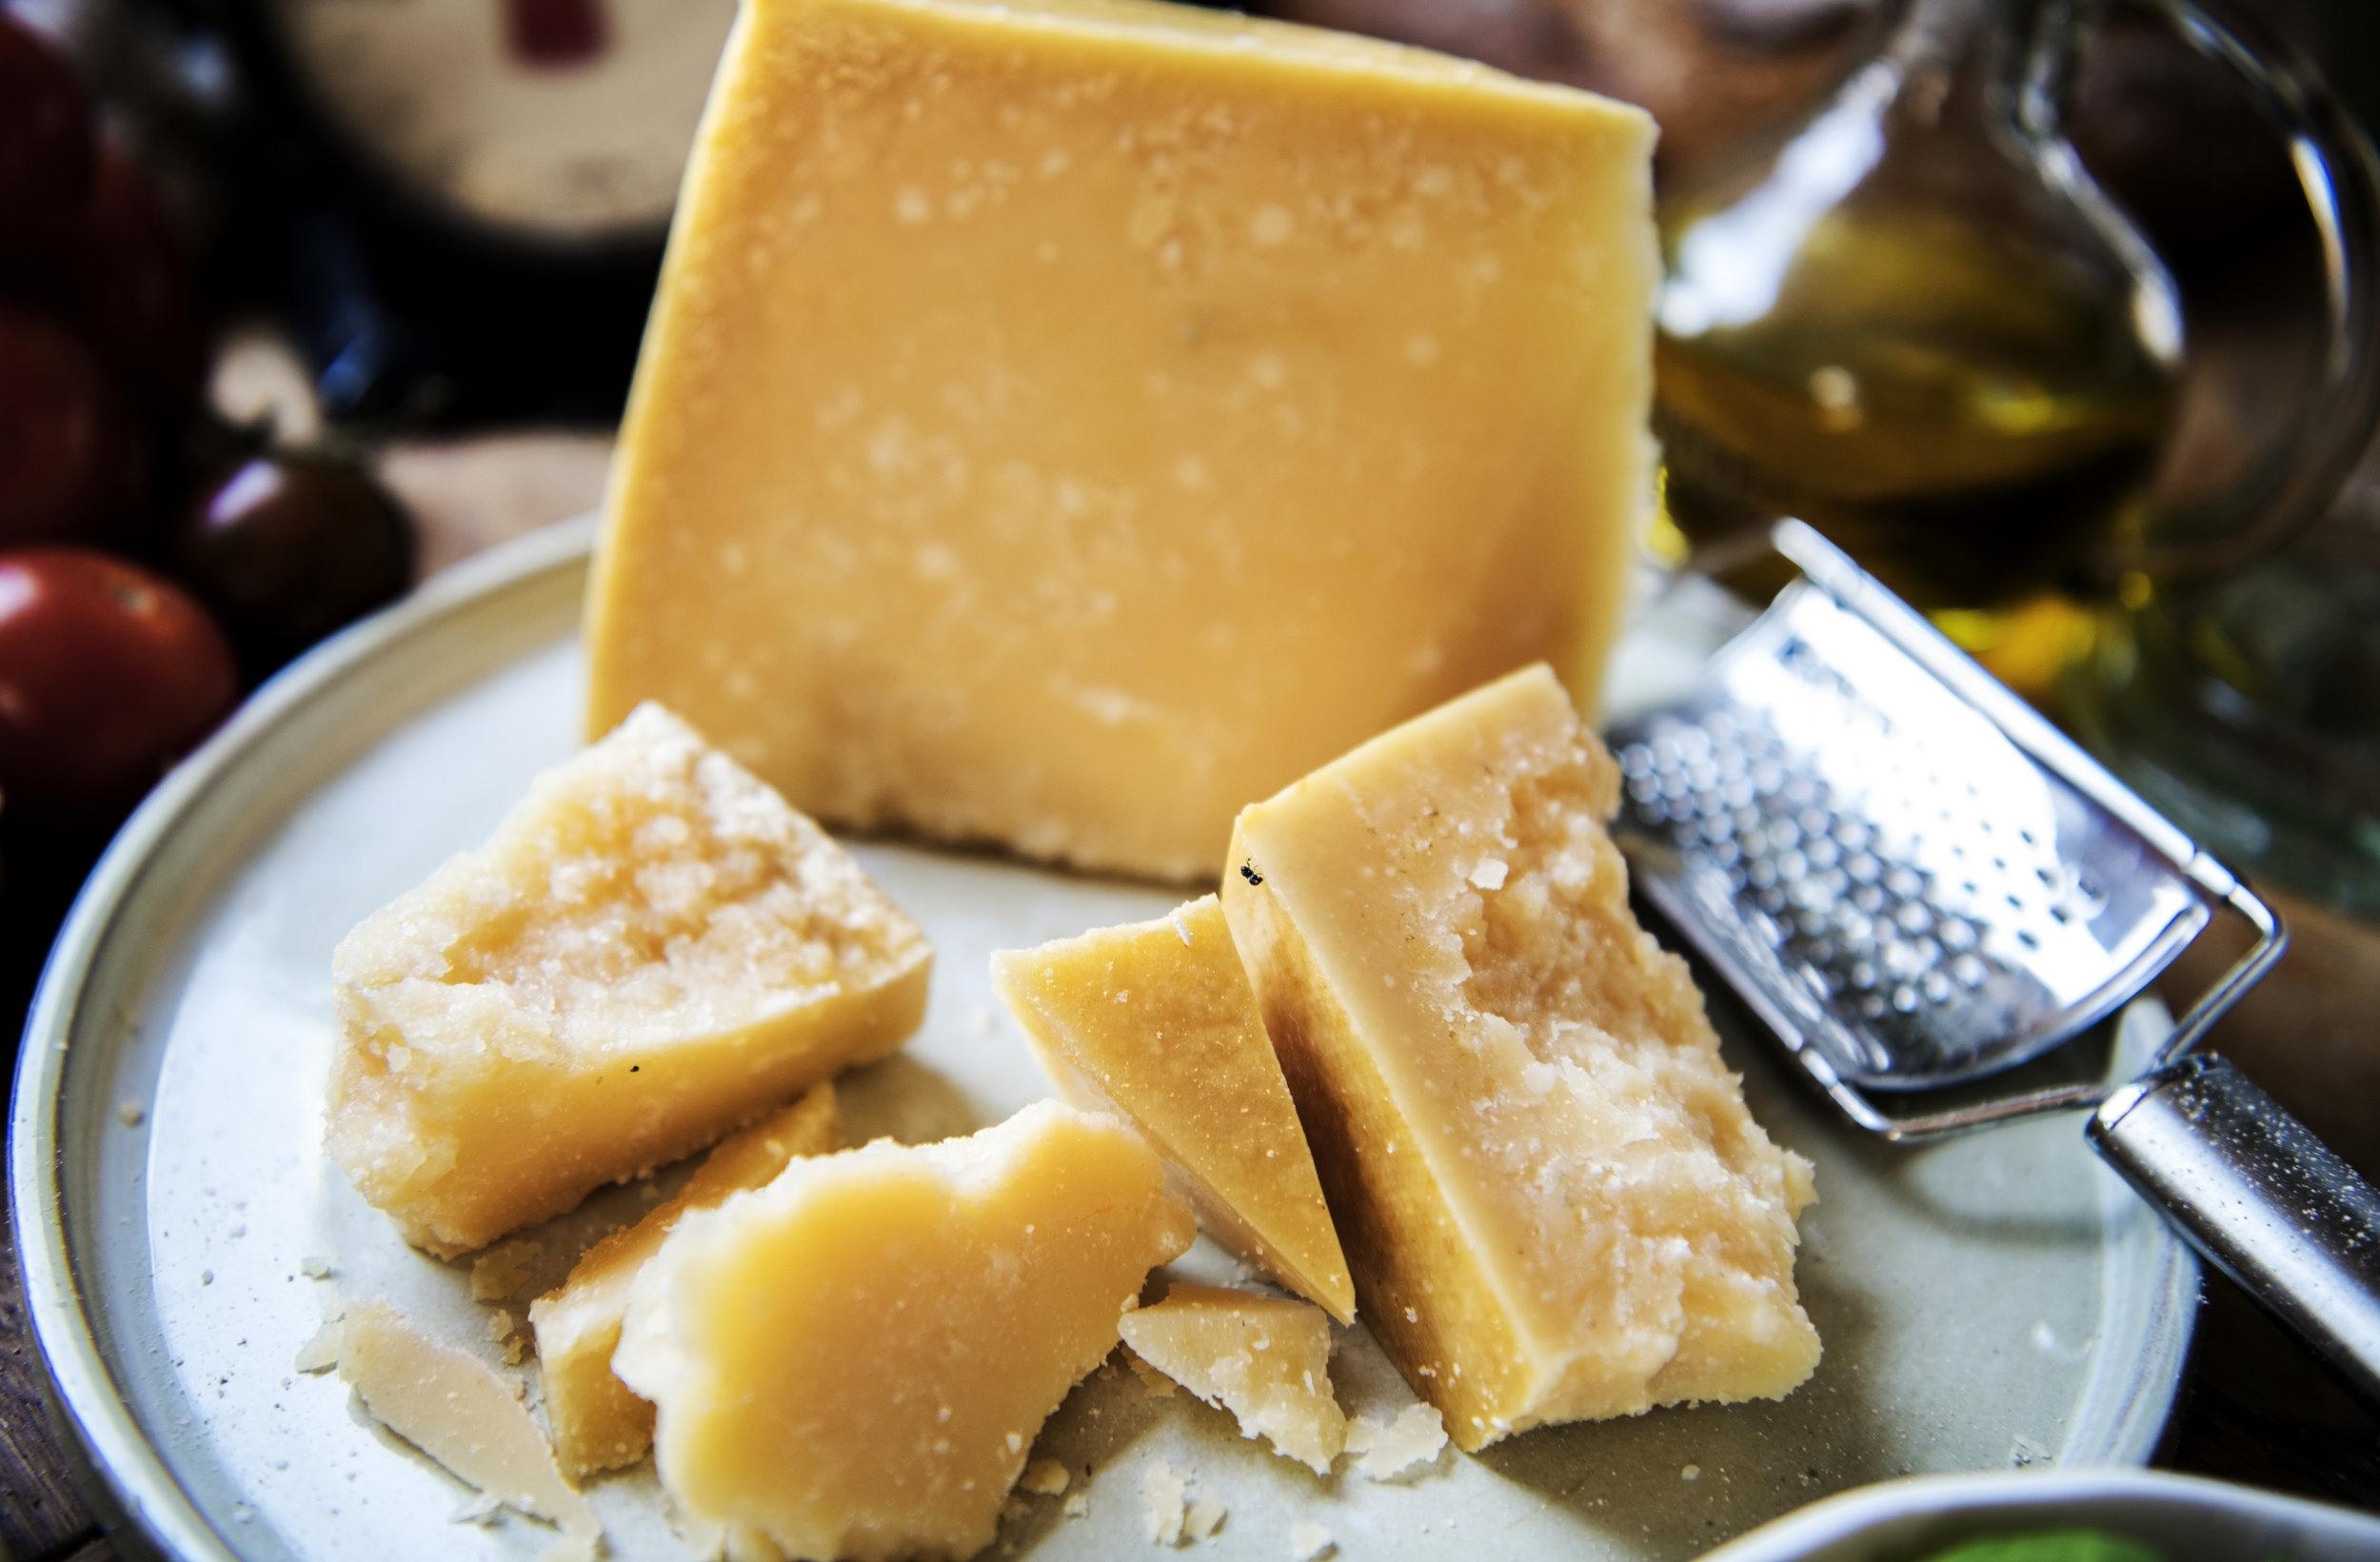 - Cheese